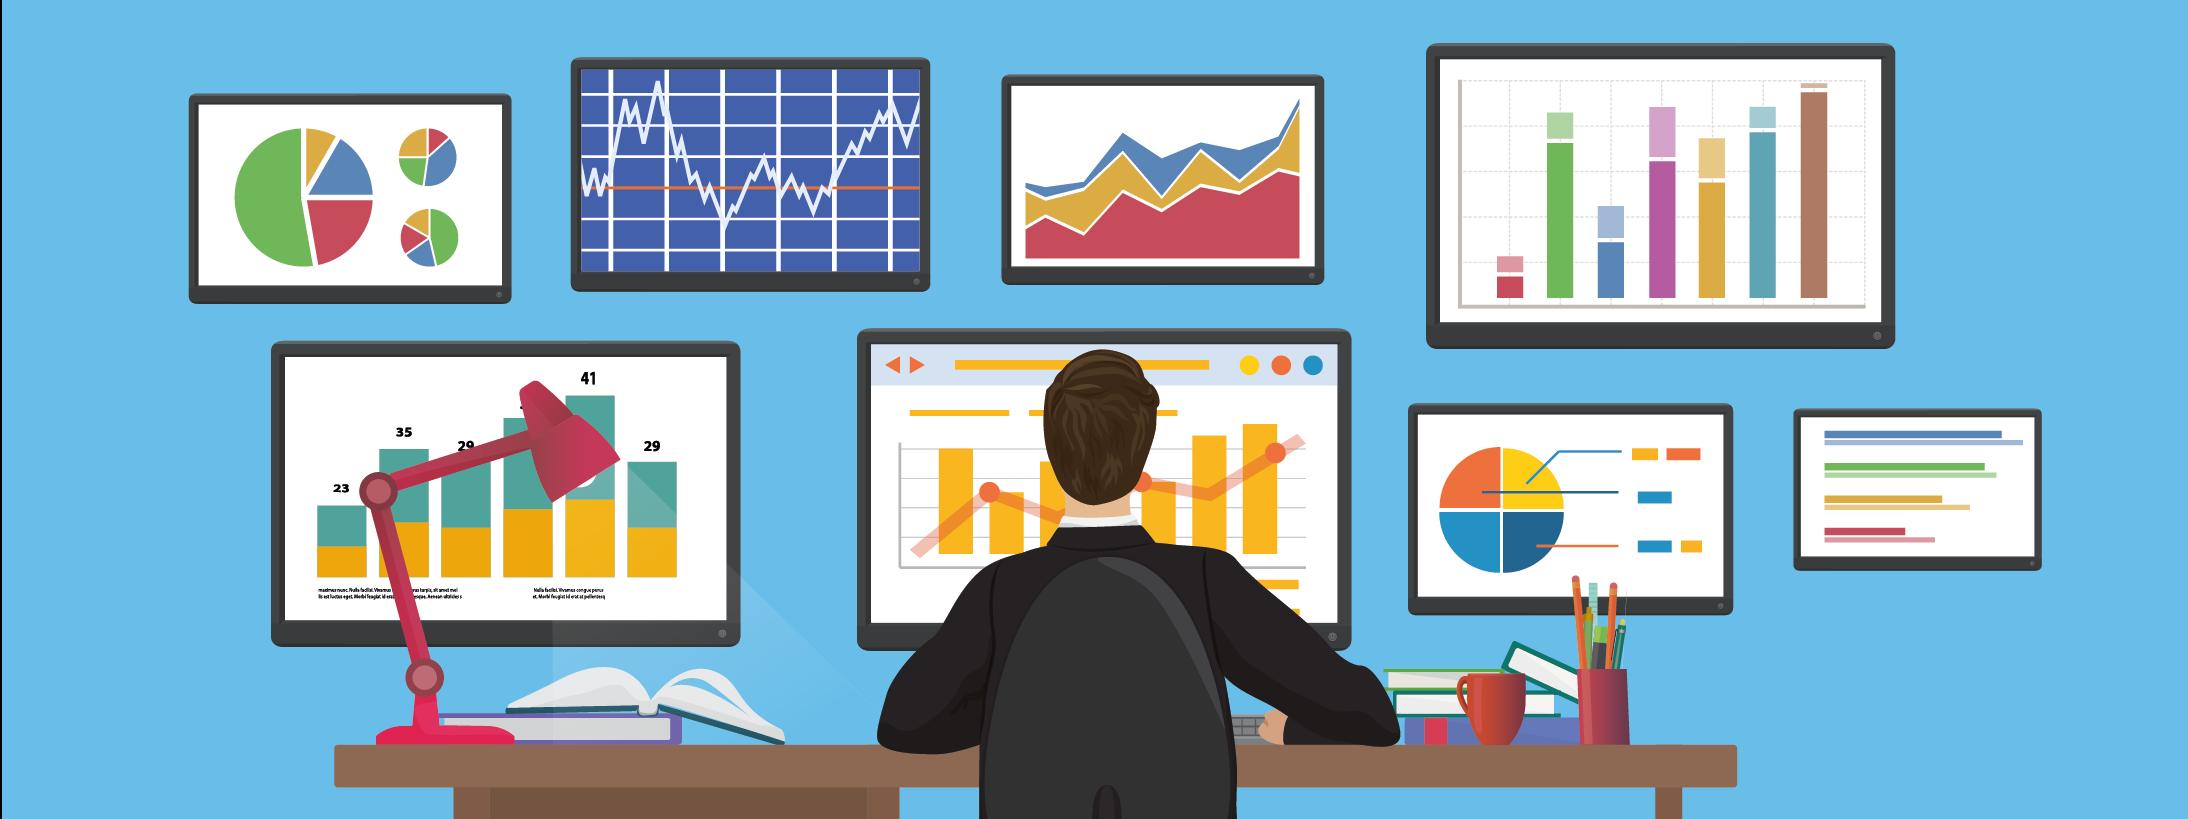 data-analysis-as-a-service